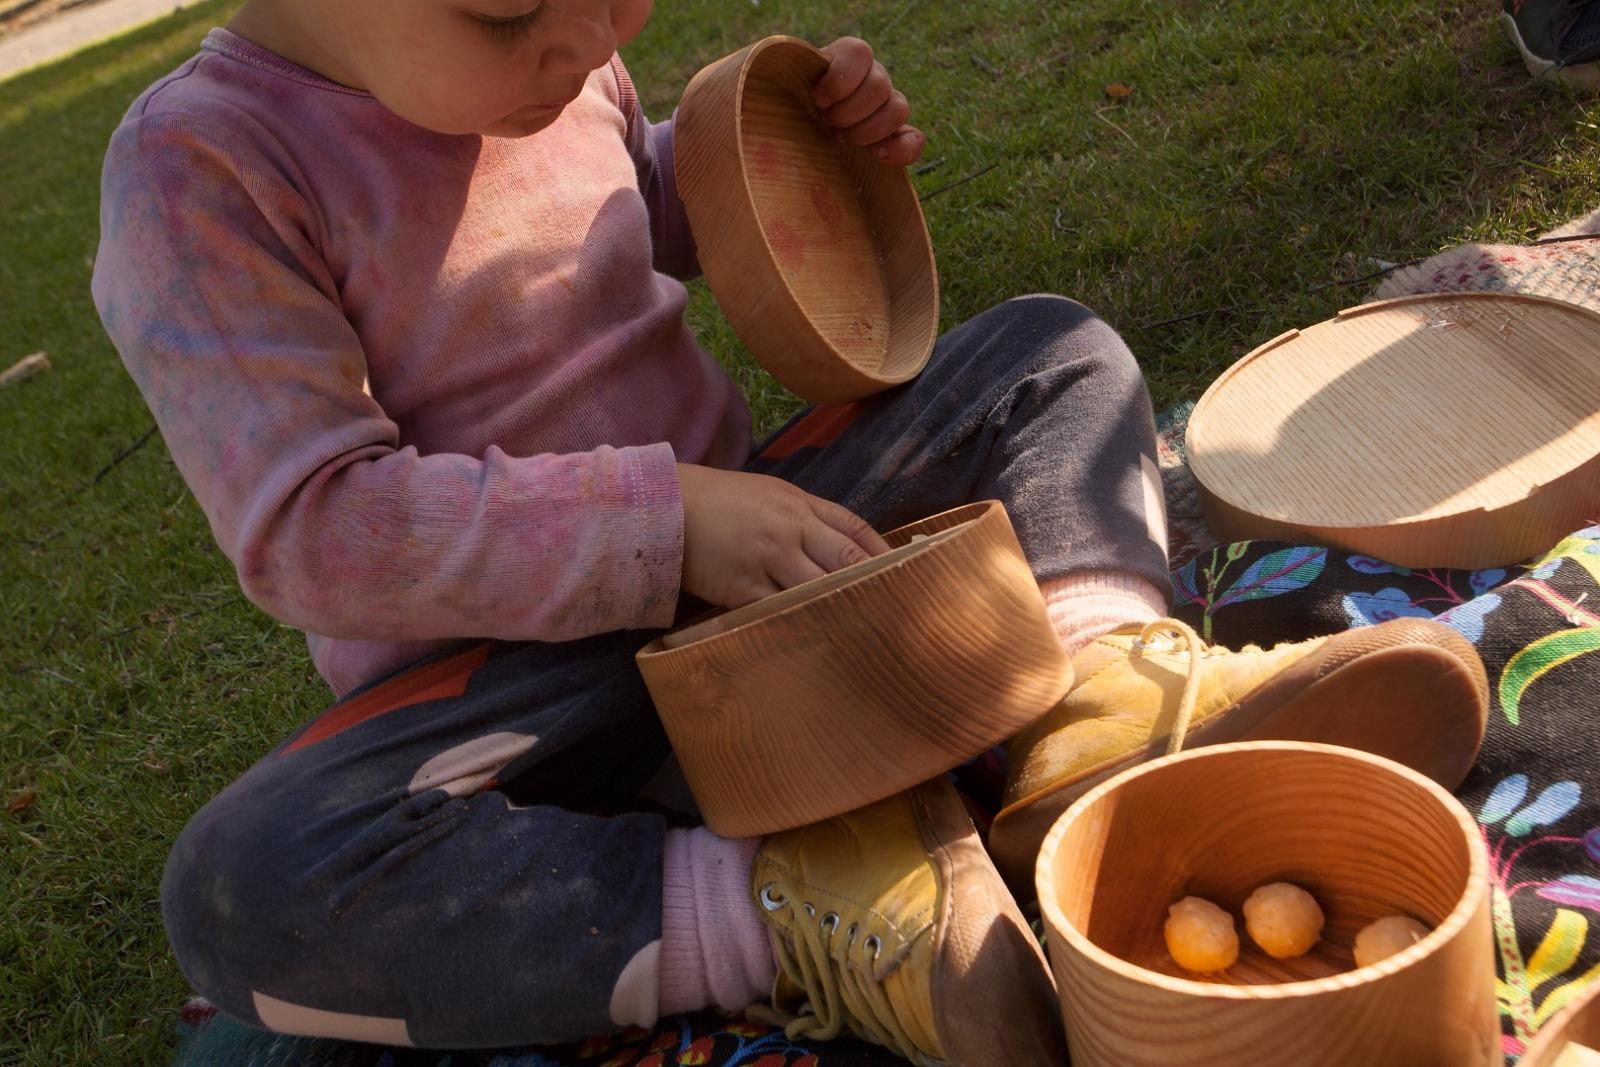 eshly Stretch Kids Bunny / biologisches Gummiband für eshly box Small and Medium / 16 cm - 5